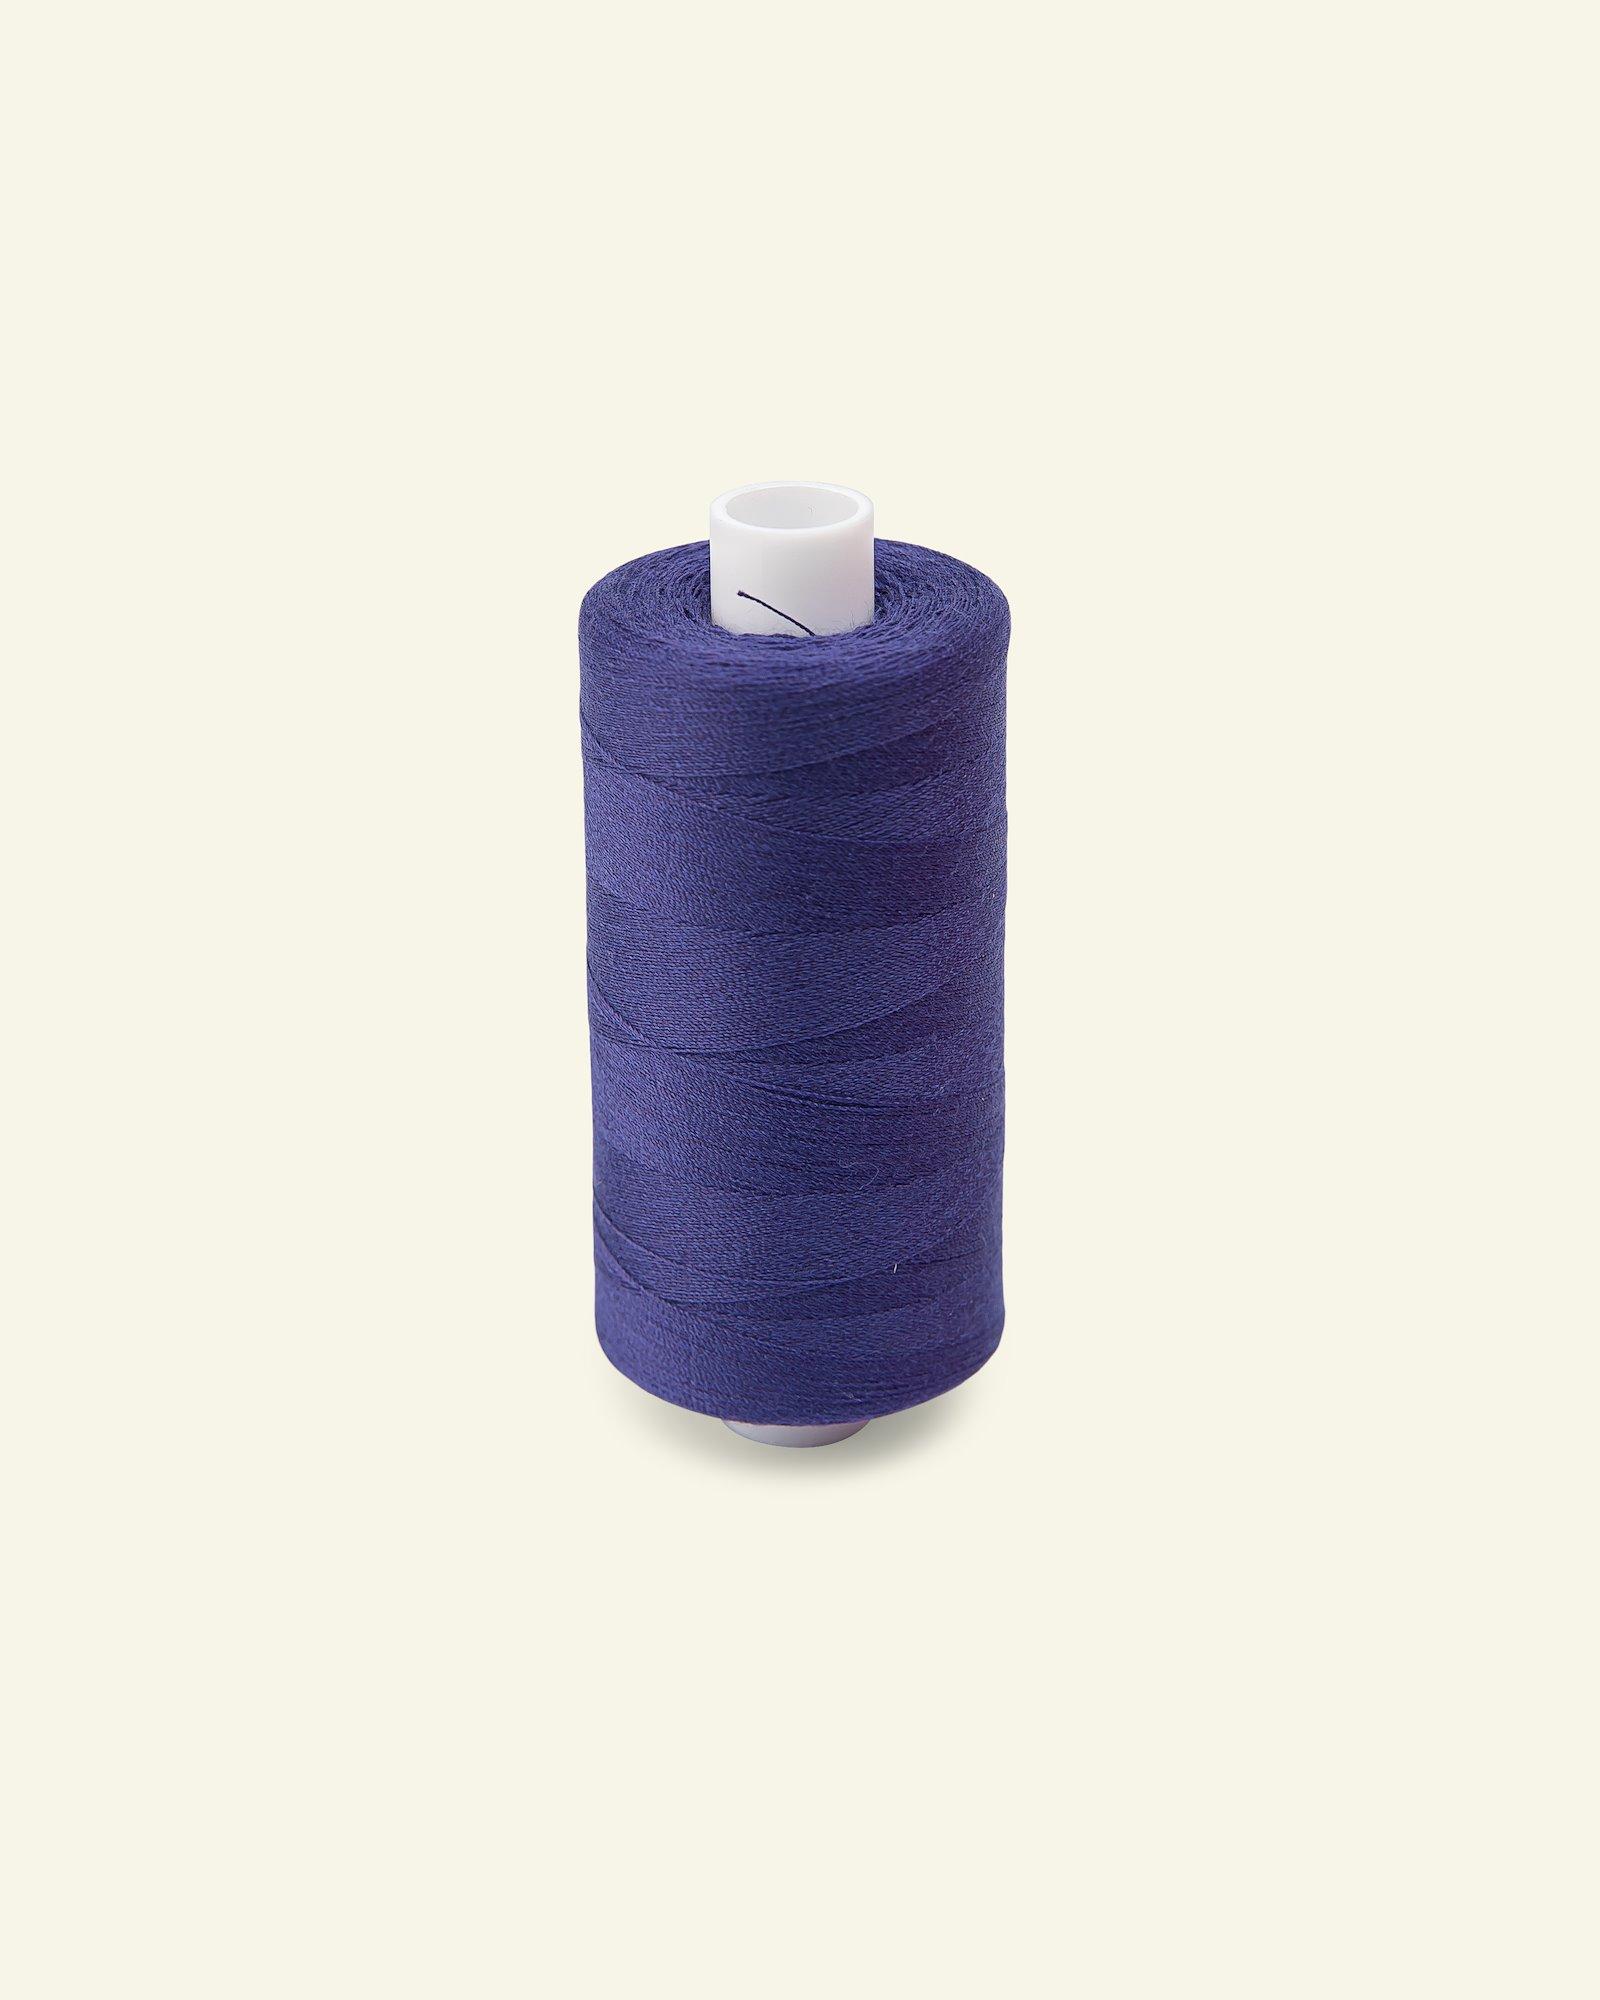 Sewing thread bluepurple 1000m